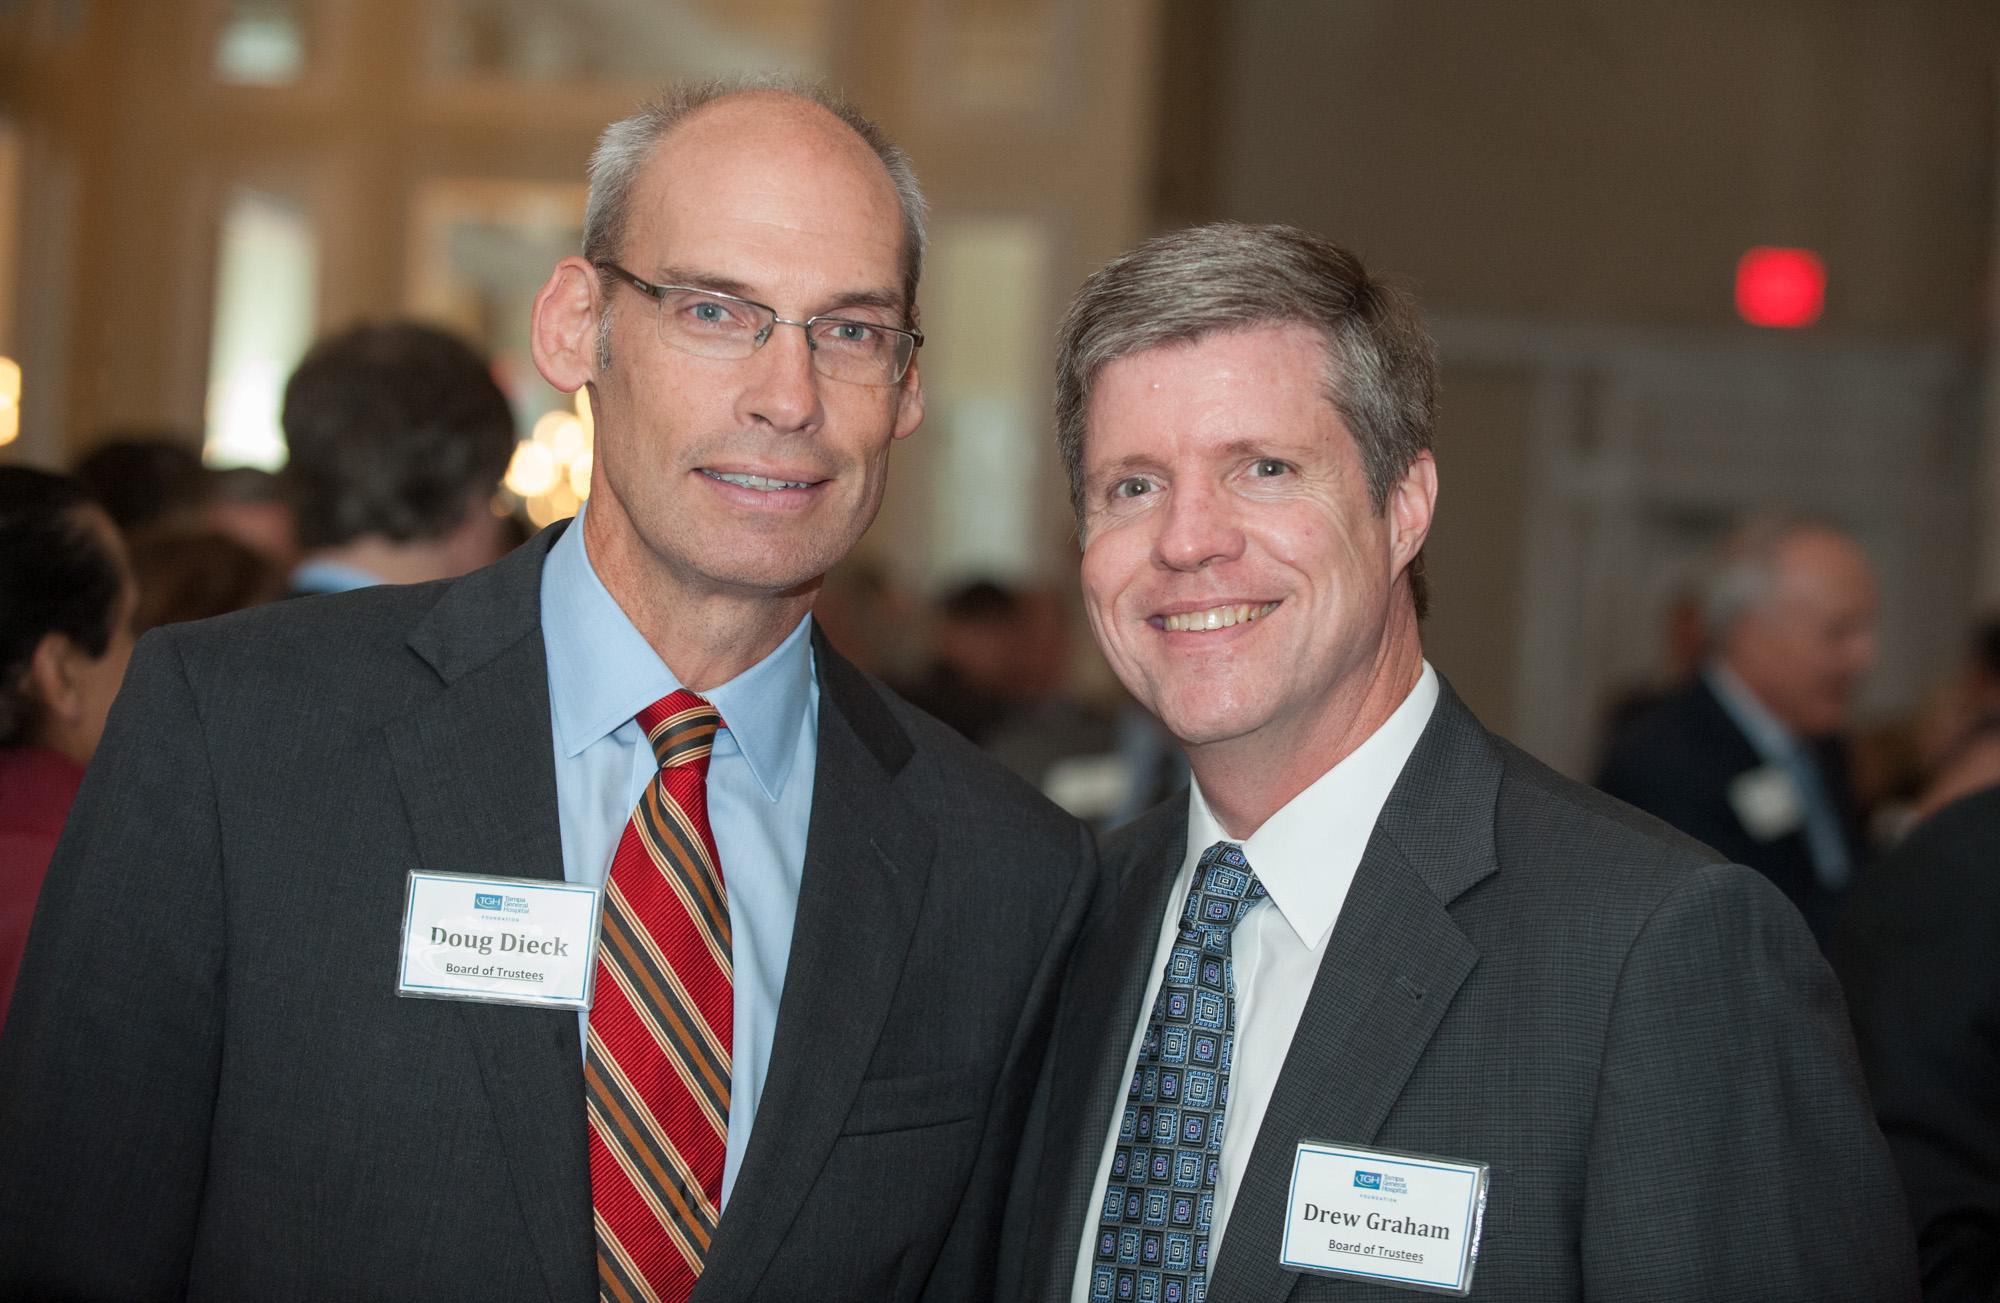 Doug Dieck and Drew Graham